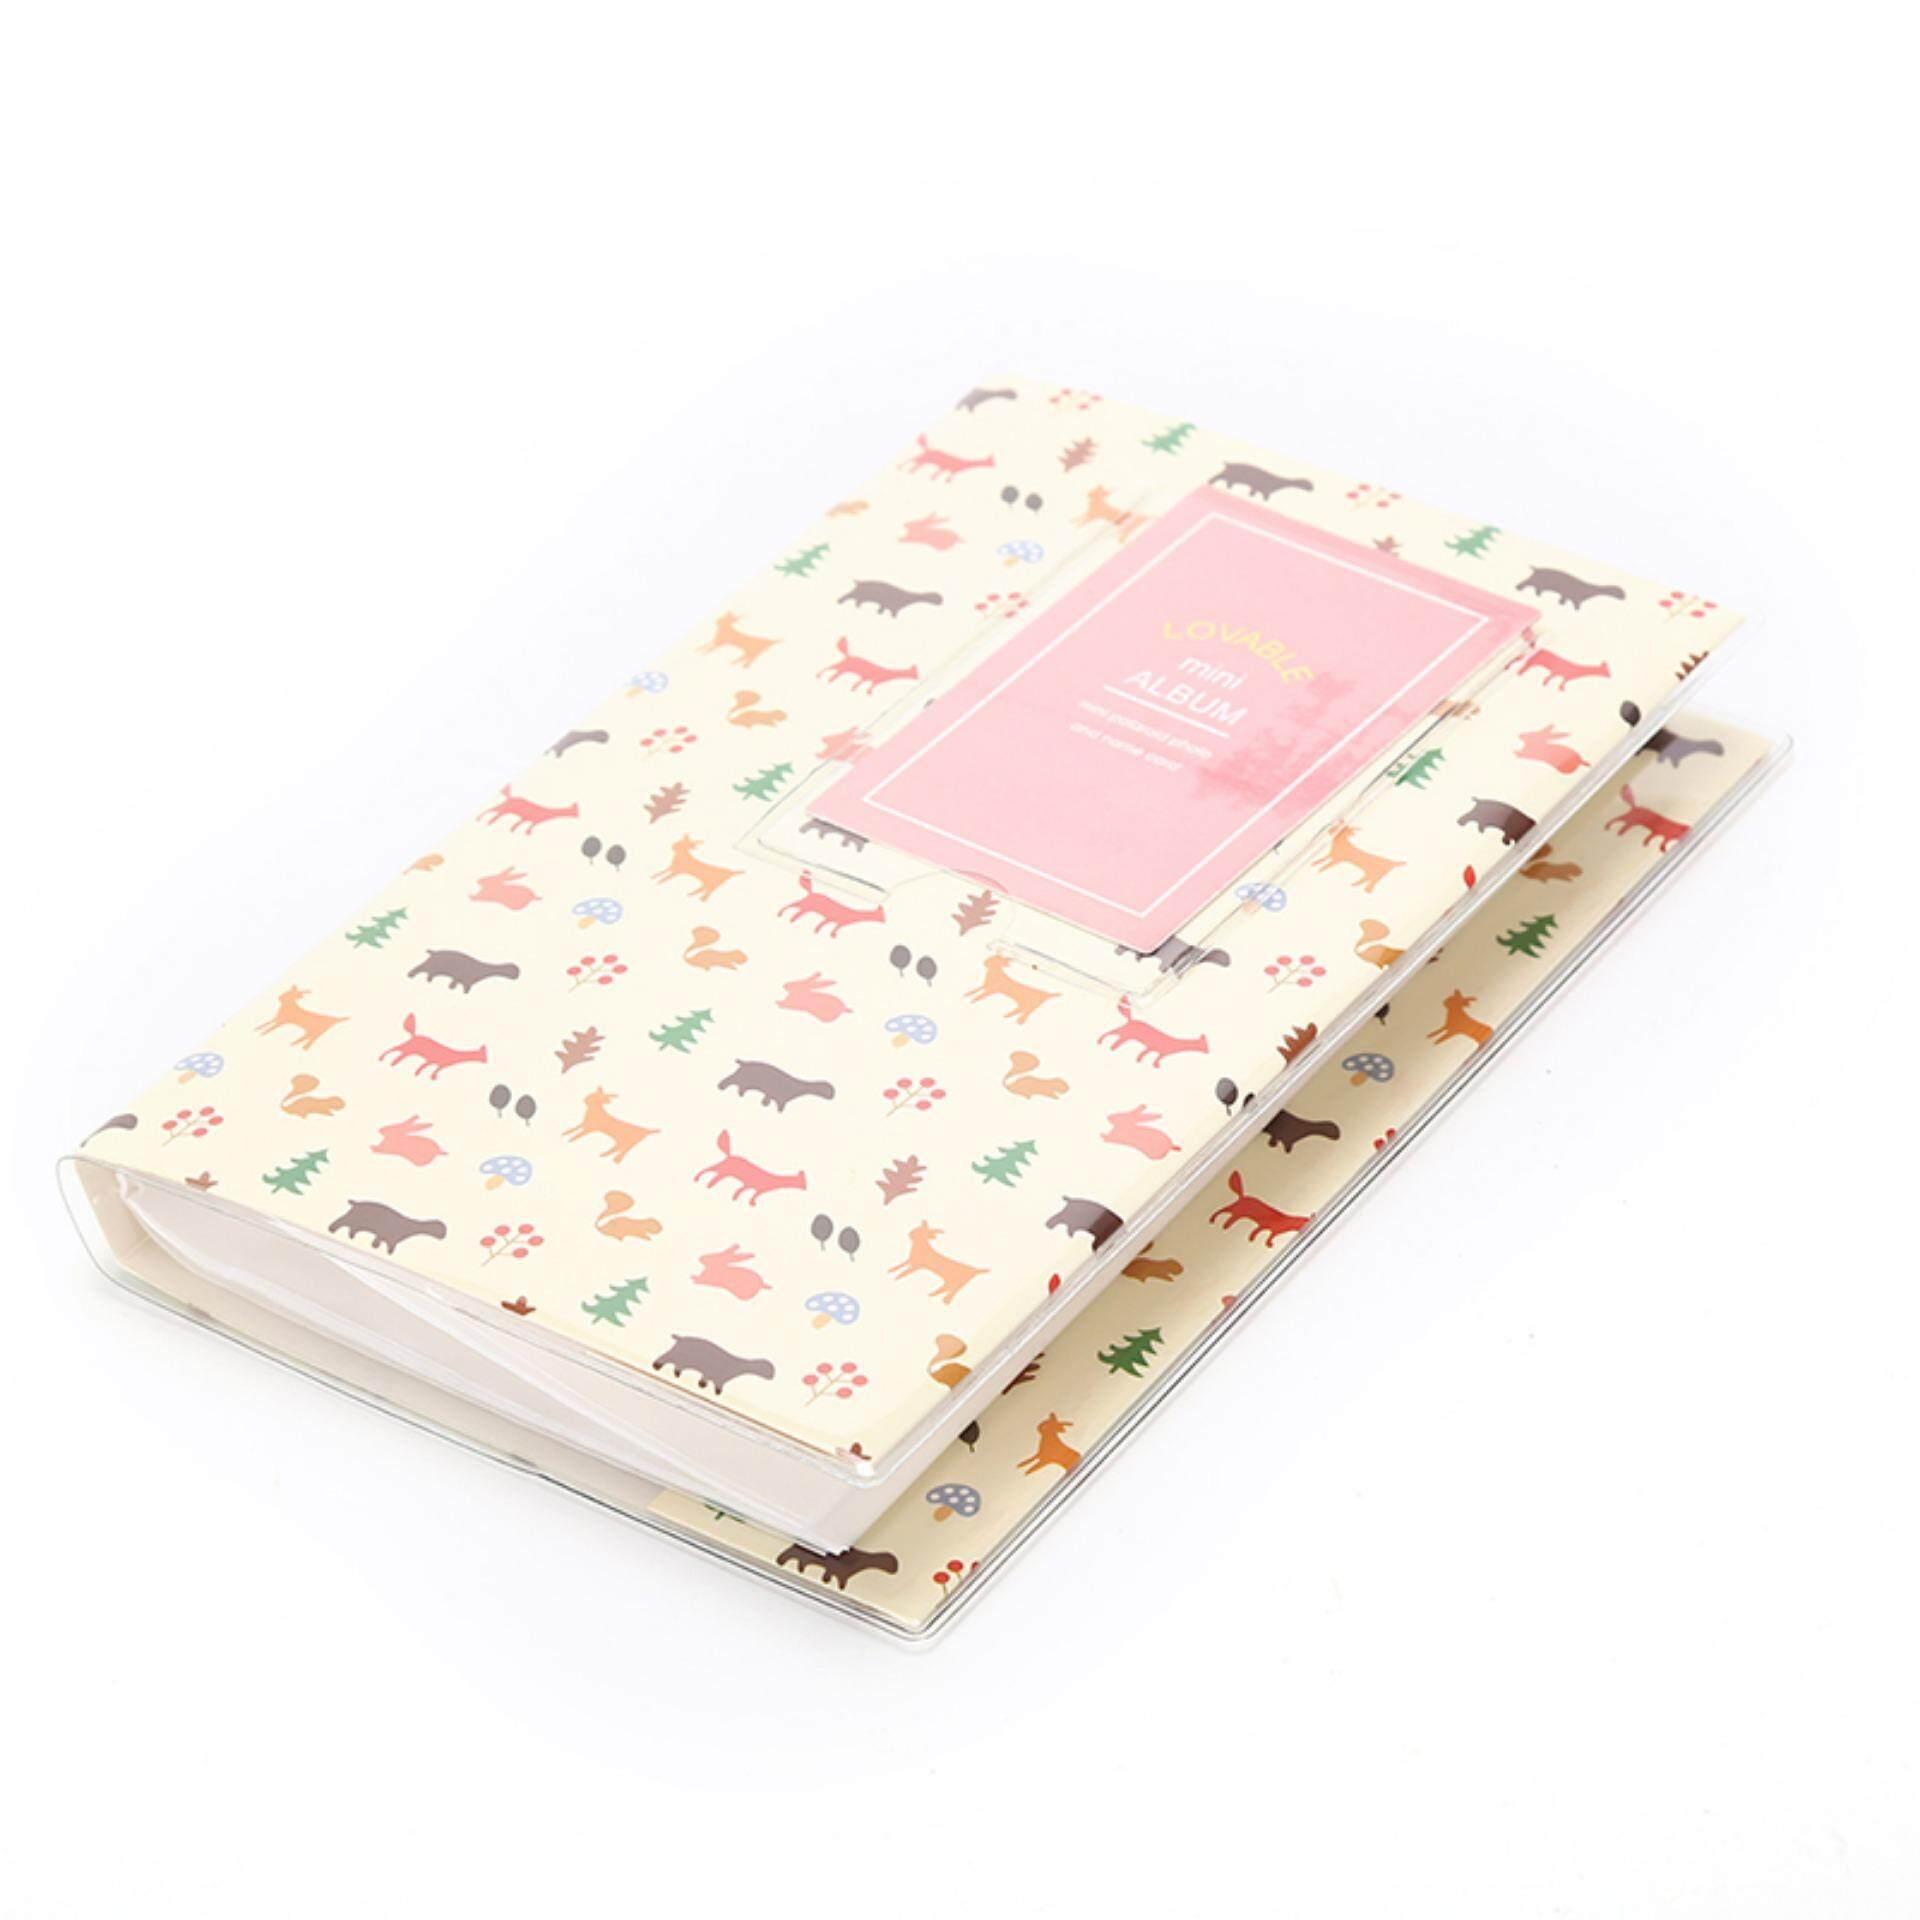 84 Pockets Album Storage Book For Fujifilm Polaroid Fuji Instax Mini 50s 7 8s 90 Style:forest By A Mango.